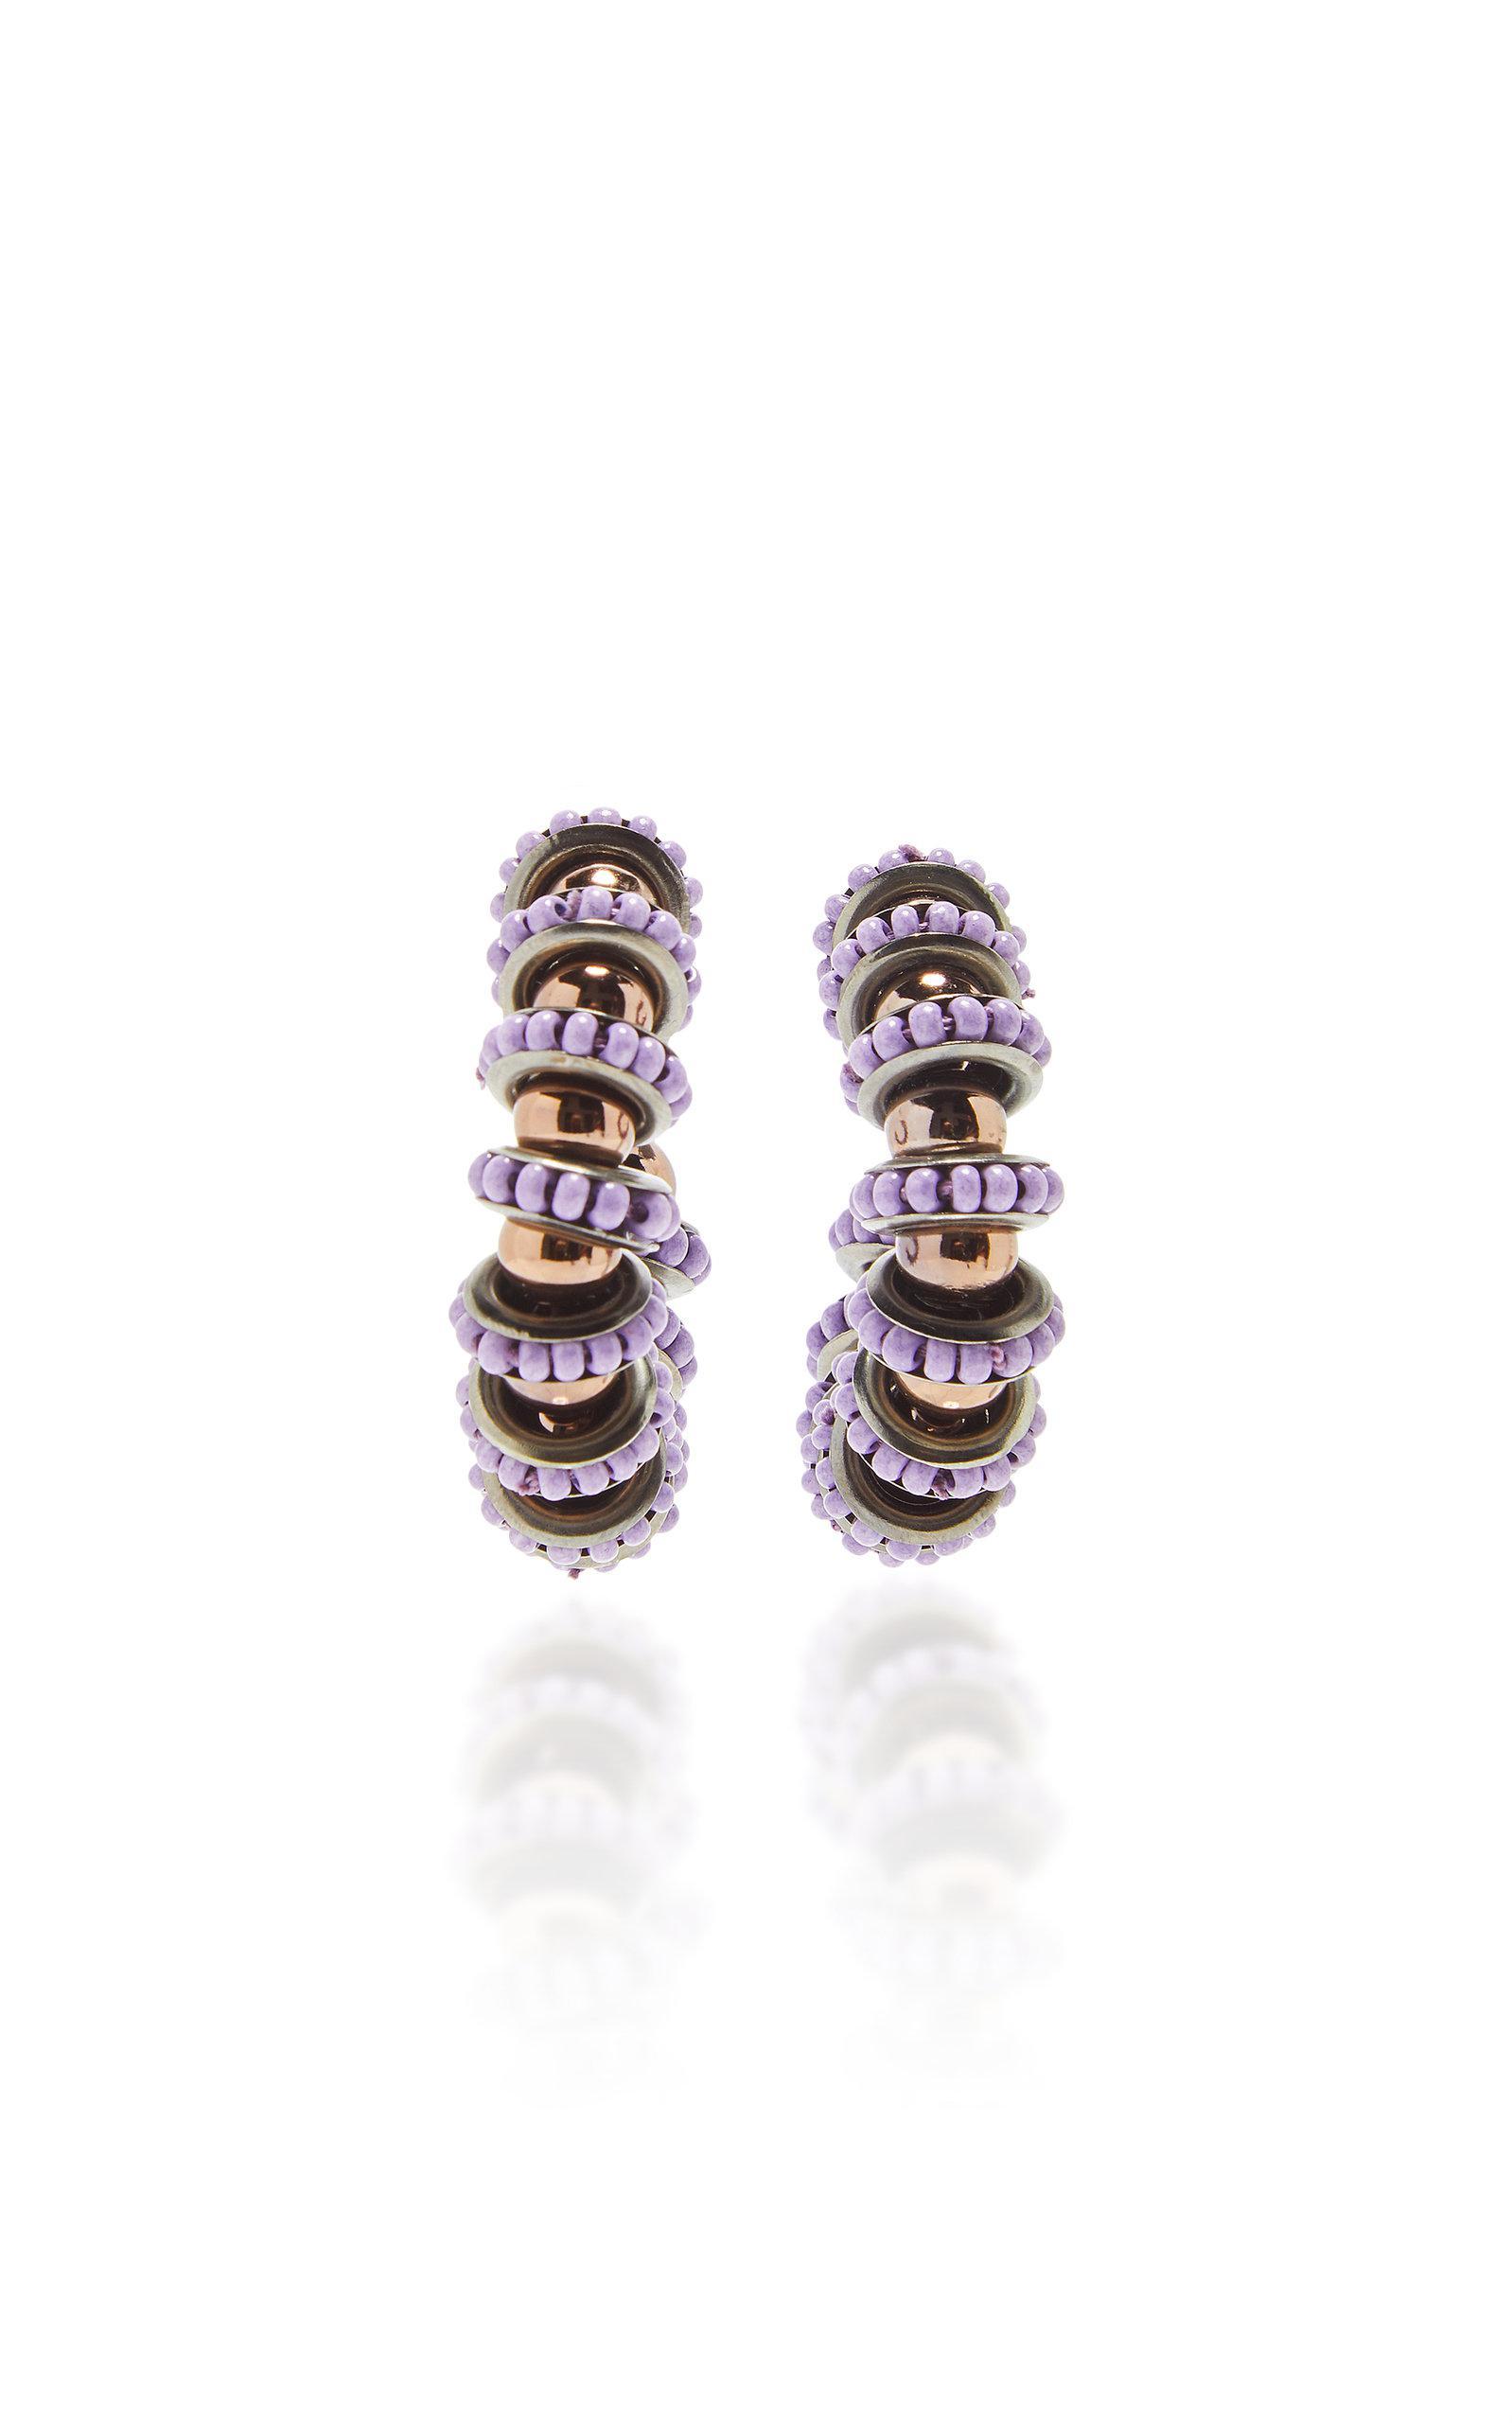 Carolina Herrera Beaded Ring Earring in Purple